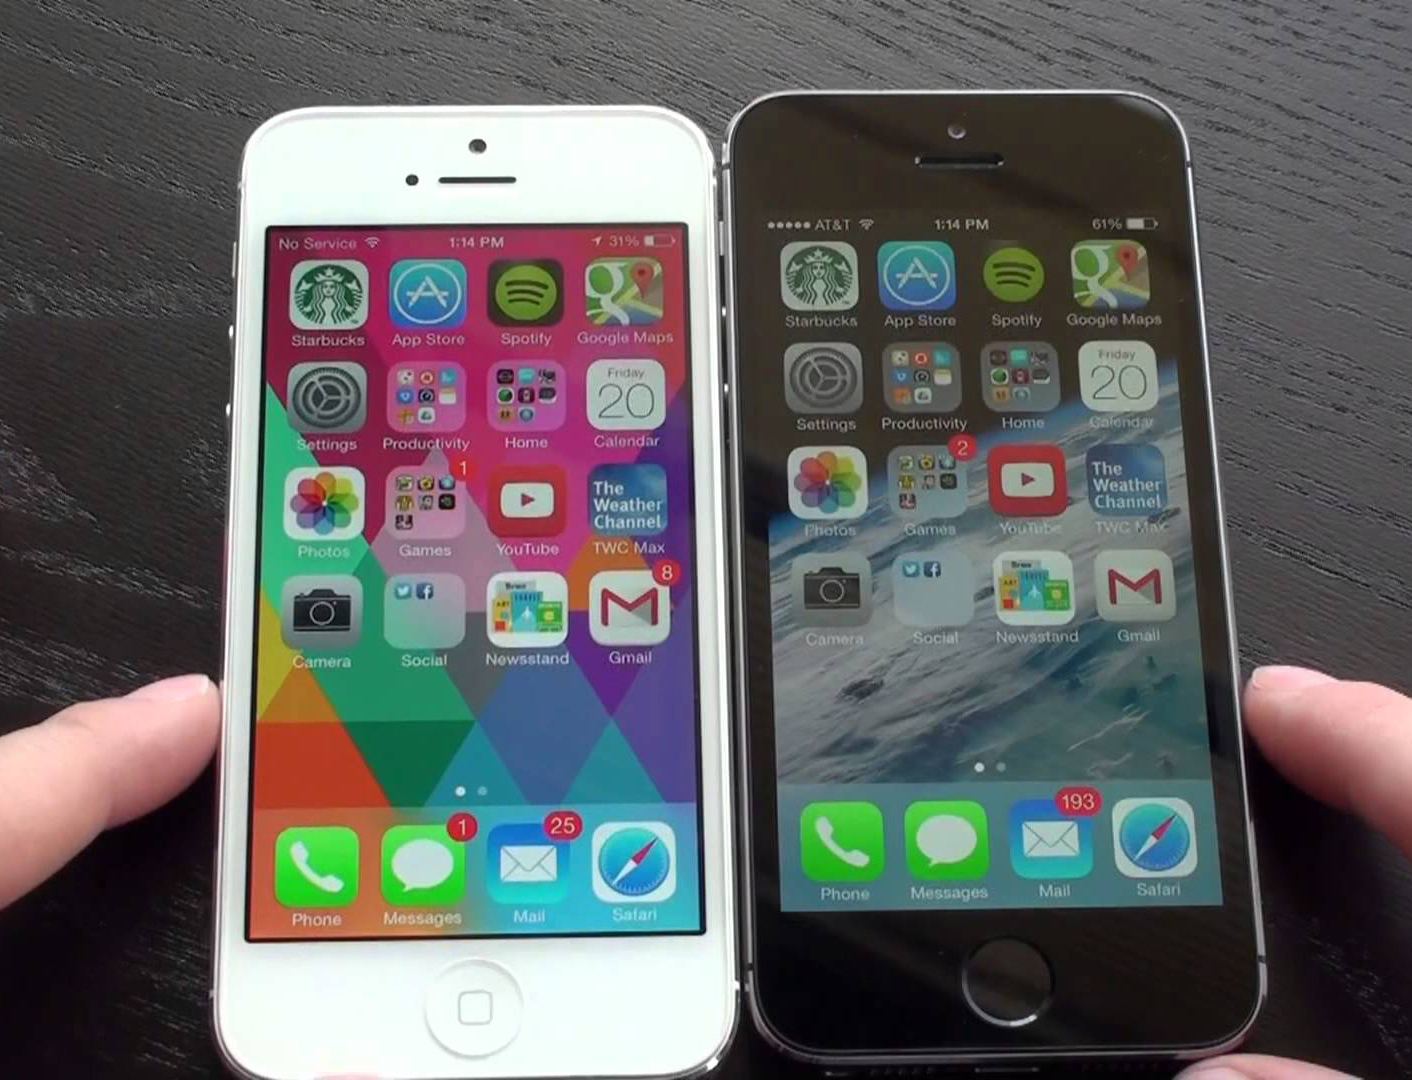 Jual iphone 5 blackmarket harga murah spesifikasi mantab iphone 5 blackmarket hitam putih reheart Choice Image